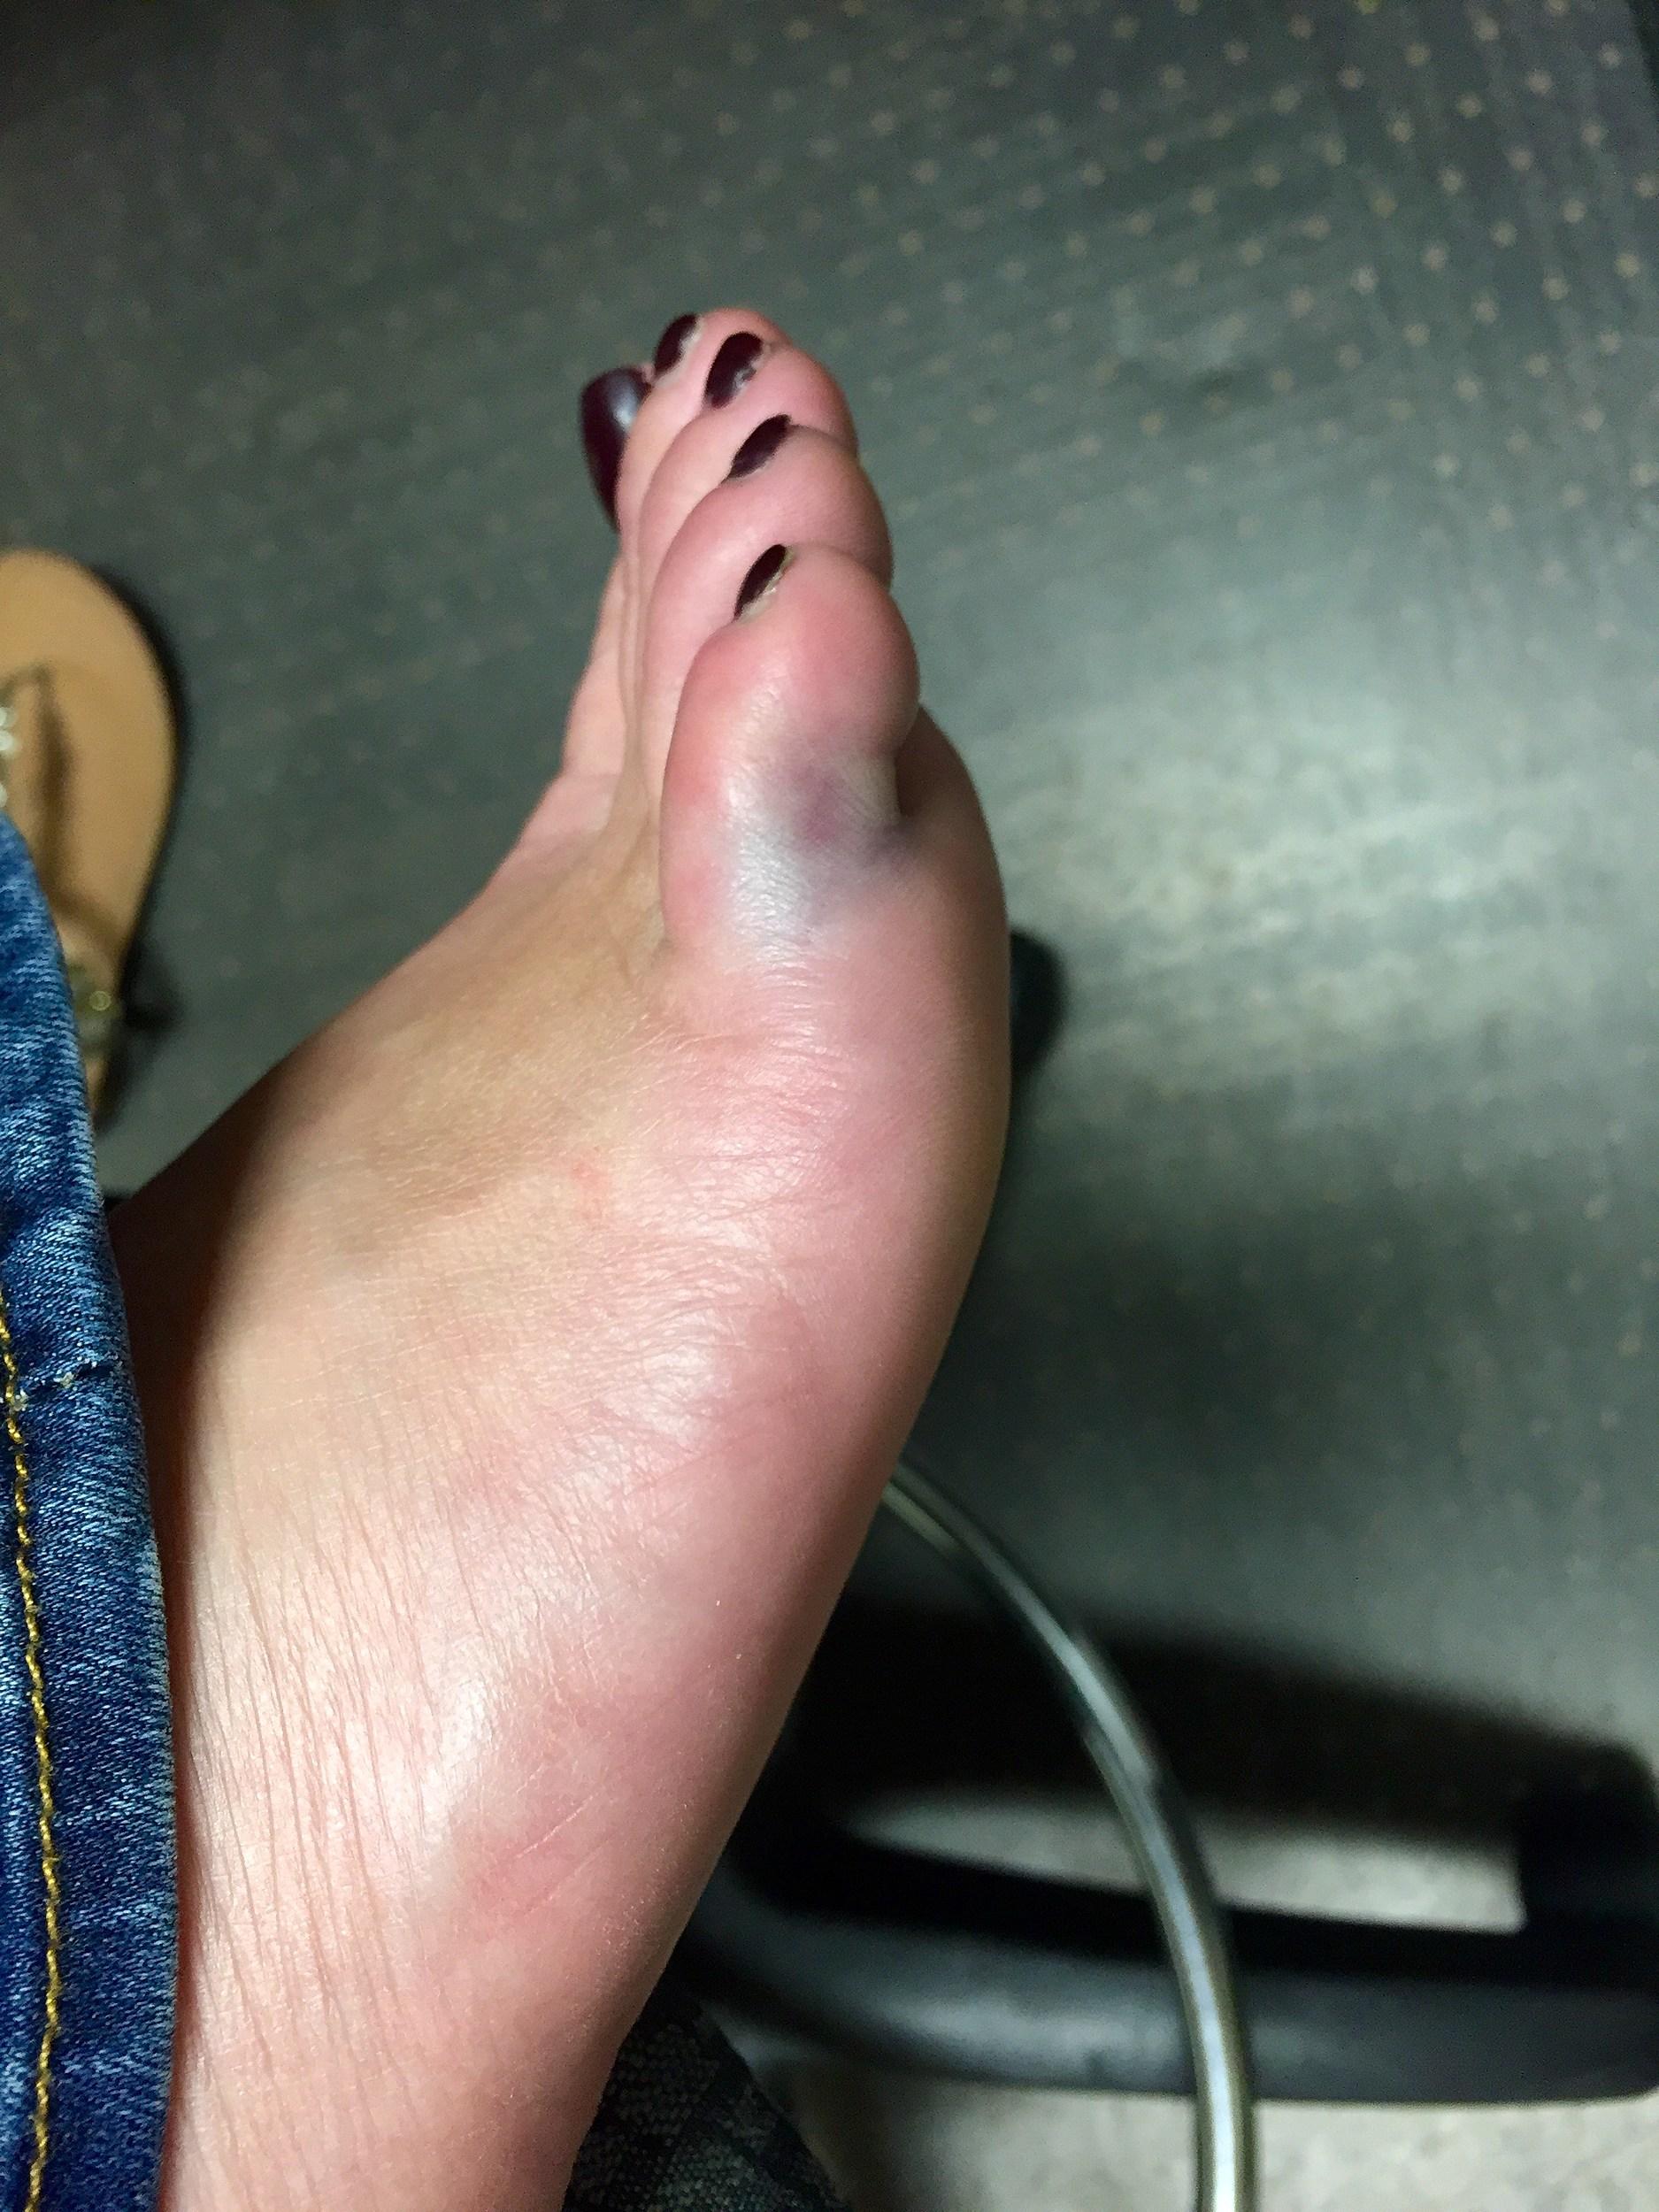 How to heal a hurt pinky toe